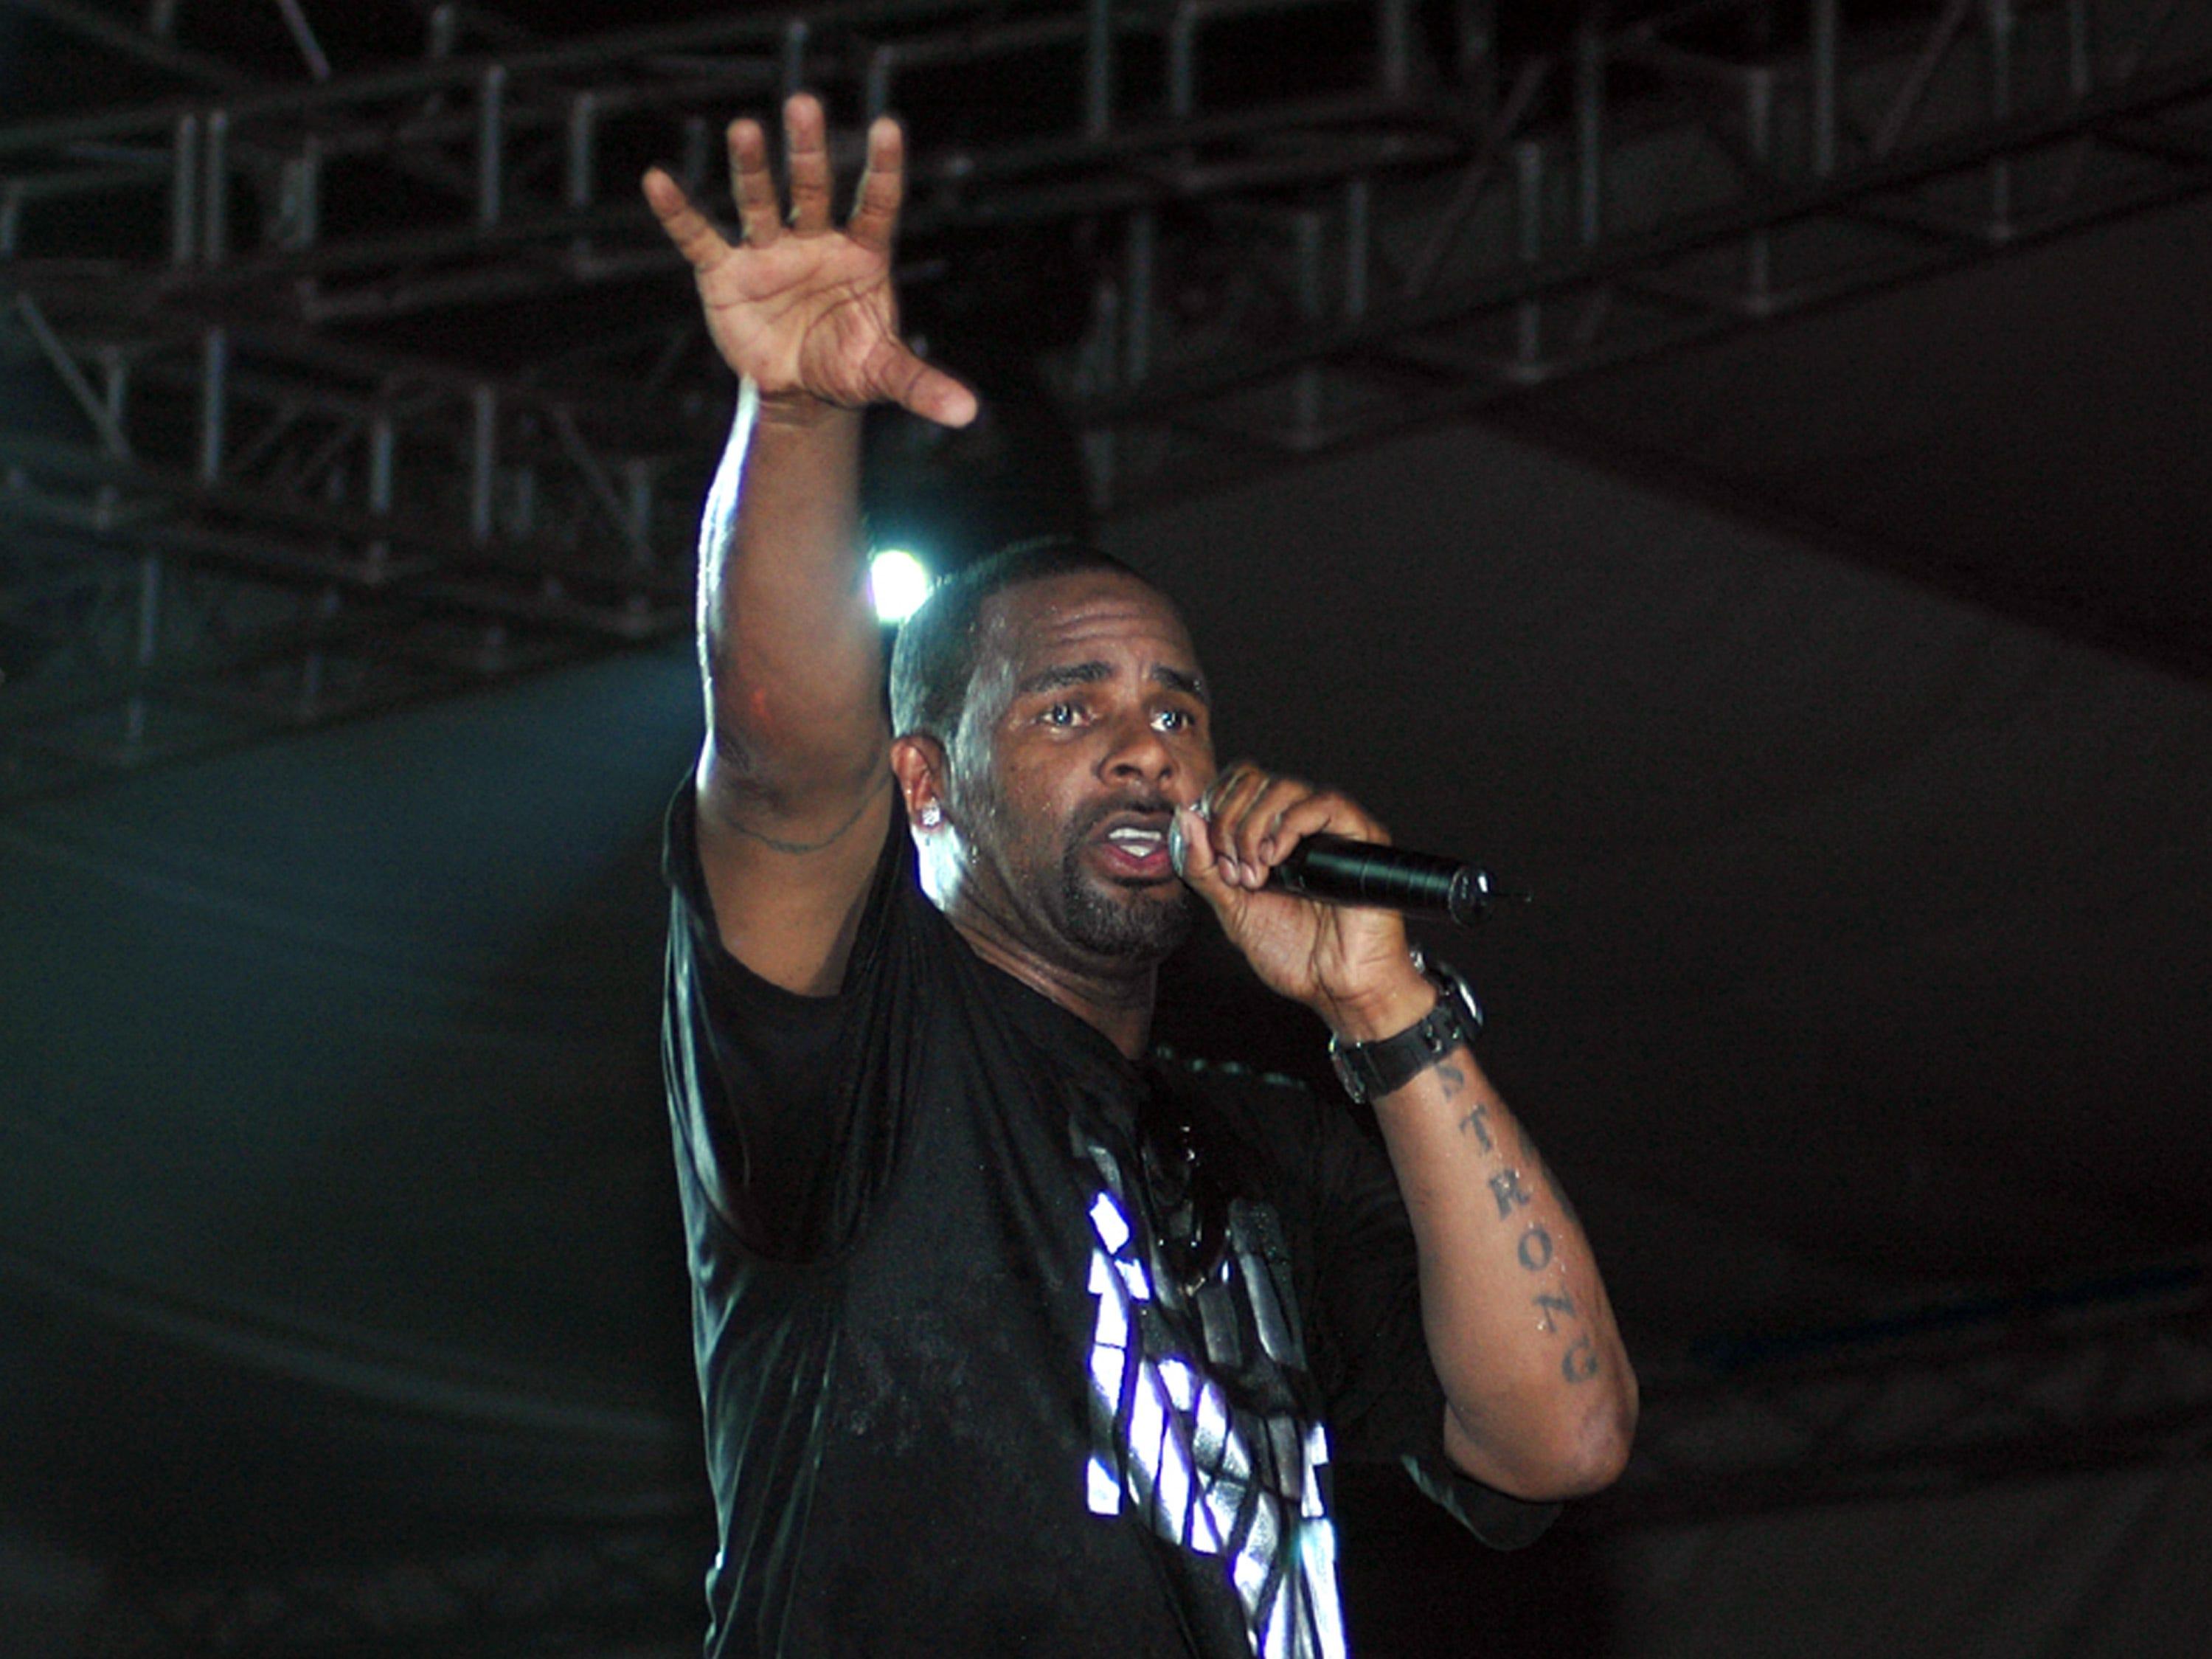 R. Kelly performs in Uganda's capital city Kampala organized by Zain Uganda , on Jan. 29, 2010.